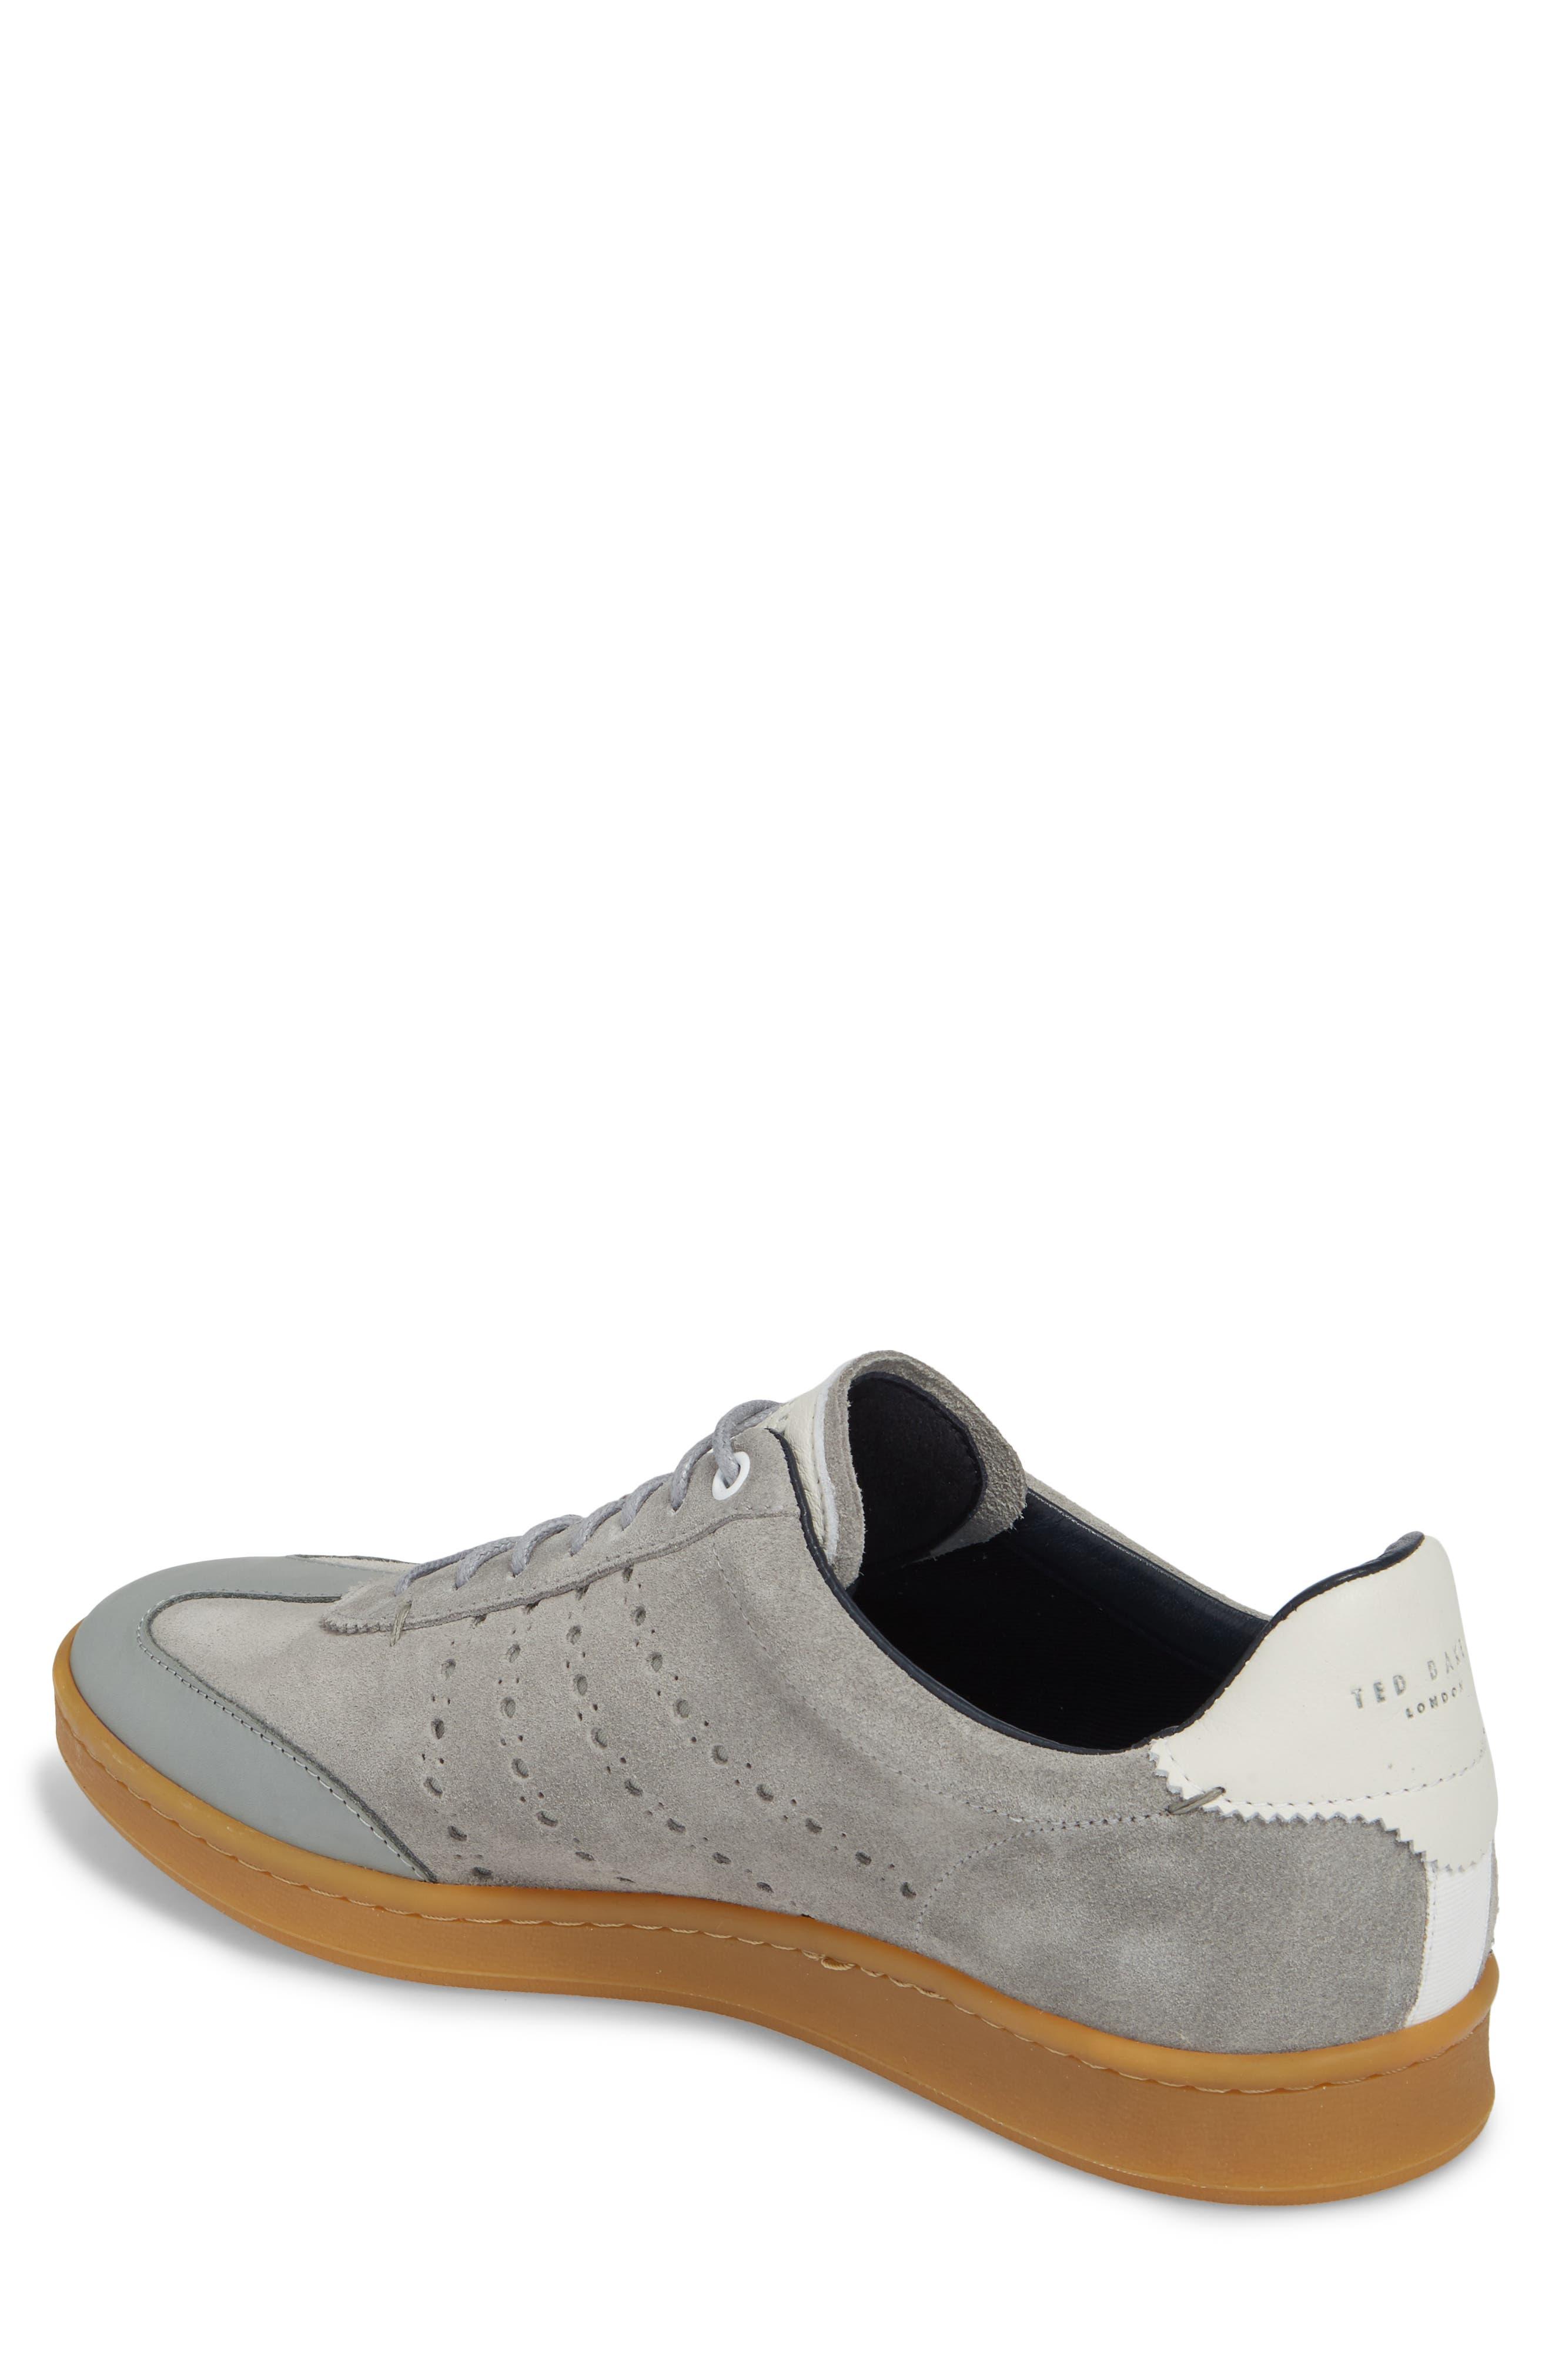 Orlees Low Top Sneaker,                             Alternate thumbnail 2, color,                             052